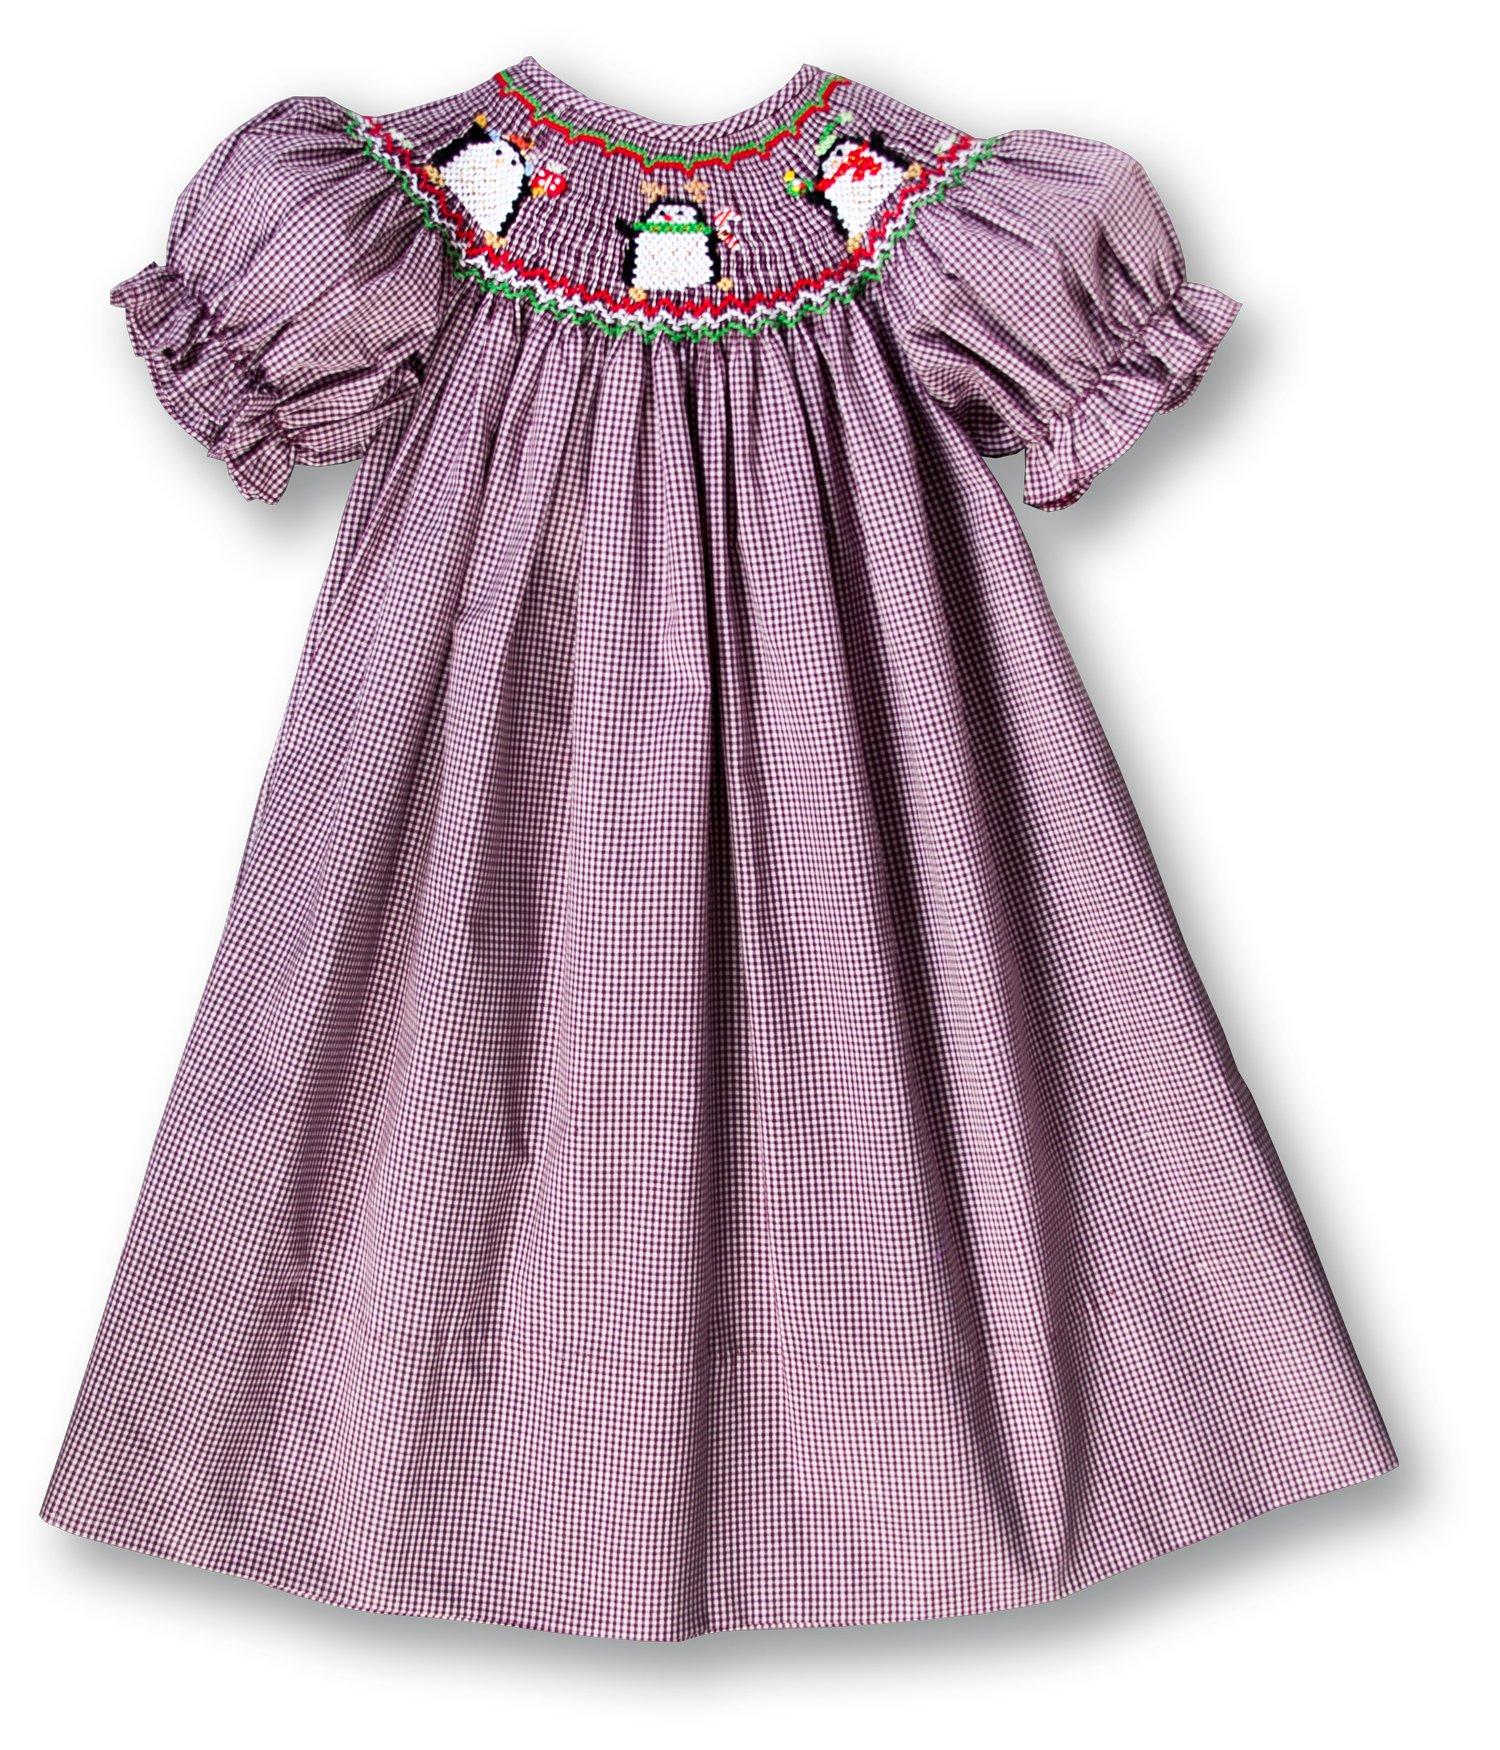 Rosalina Girl's Christmas Penguins Berry Red Gingham Smocked Bishop Dress 3T